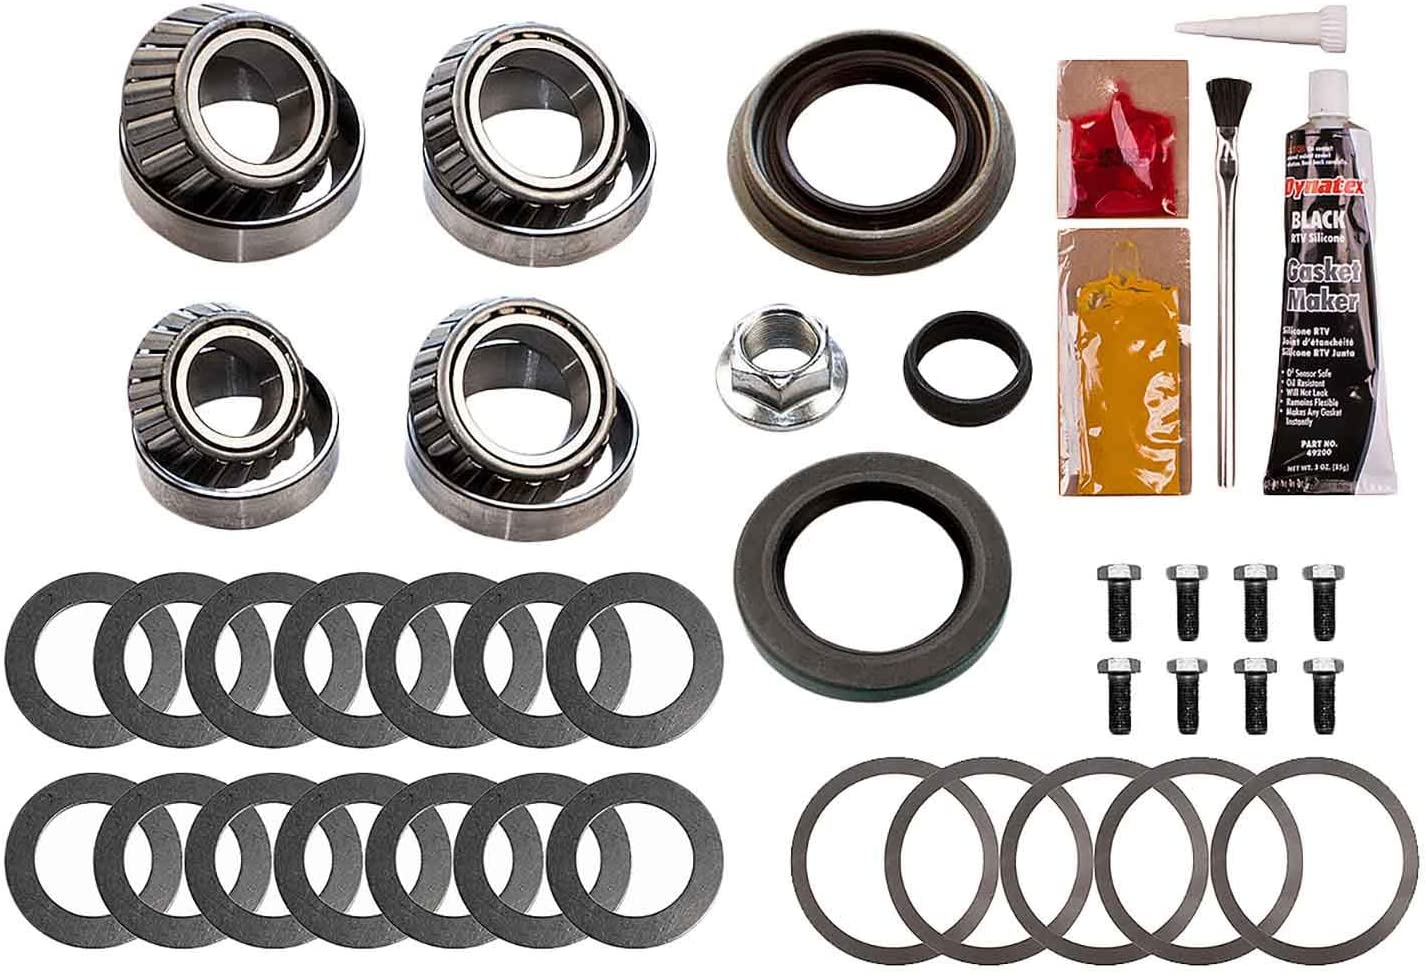 DANA 35 1980-2006 ExCel XL-1060-1 Bearing Master Kit 1 Pack